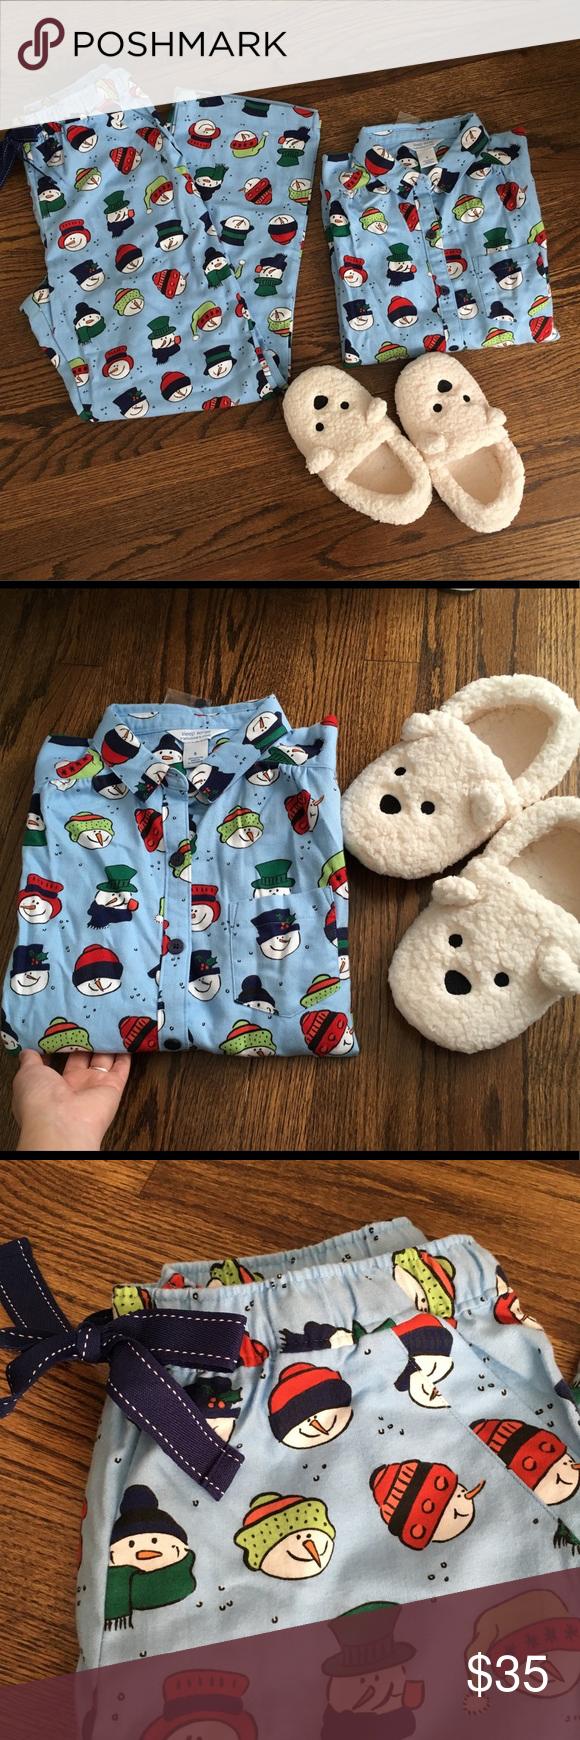 Snowman Pajamas Set Portuguese Flannel Sleep Sense Brand new with tag.  Portuguese Flannel. 100 c223bcf6d